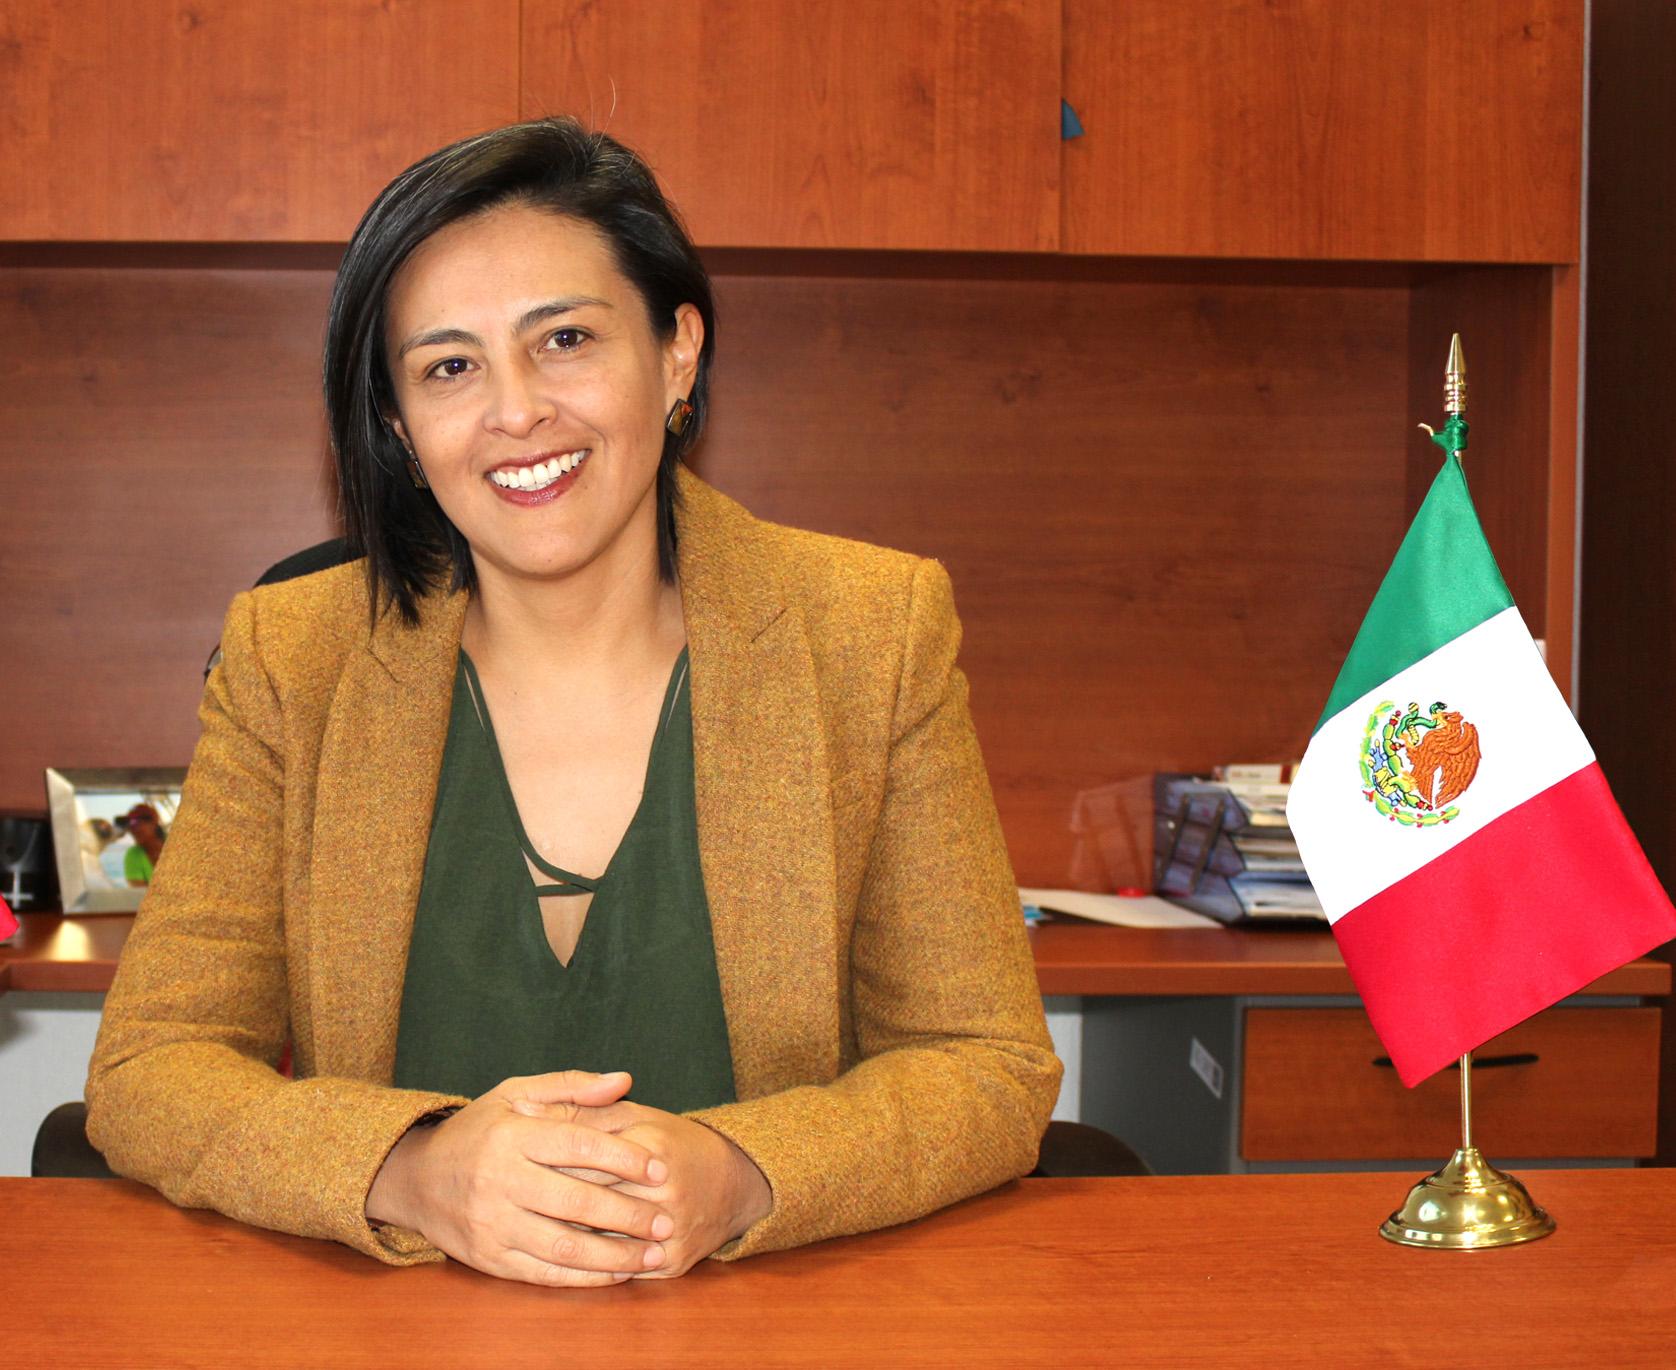 Anita María Suárez Valencia